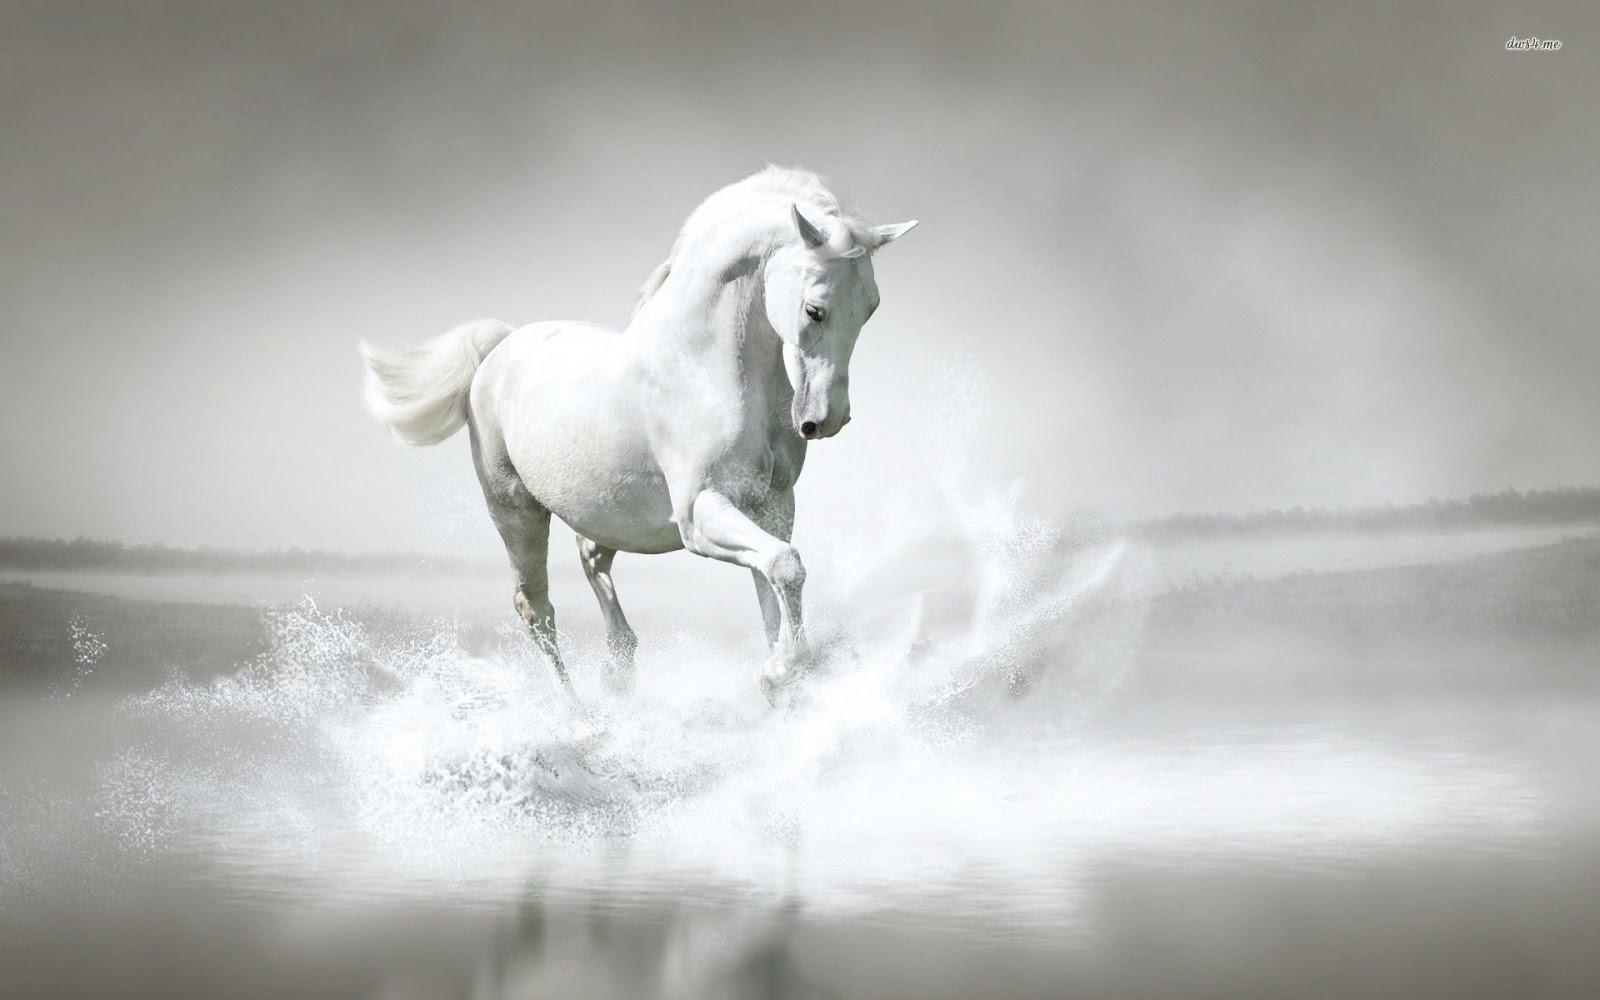 Simple   Wallpaper Horse Ultra Hd - 3HwvVma  Image_628821.jpg